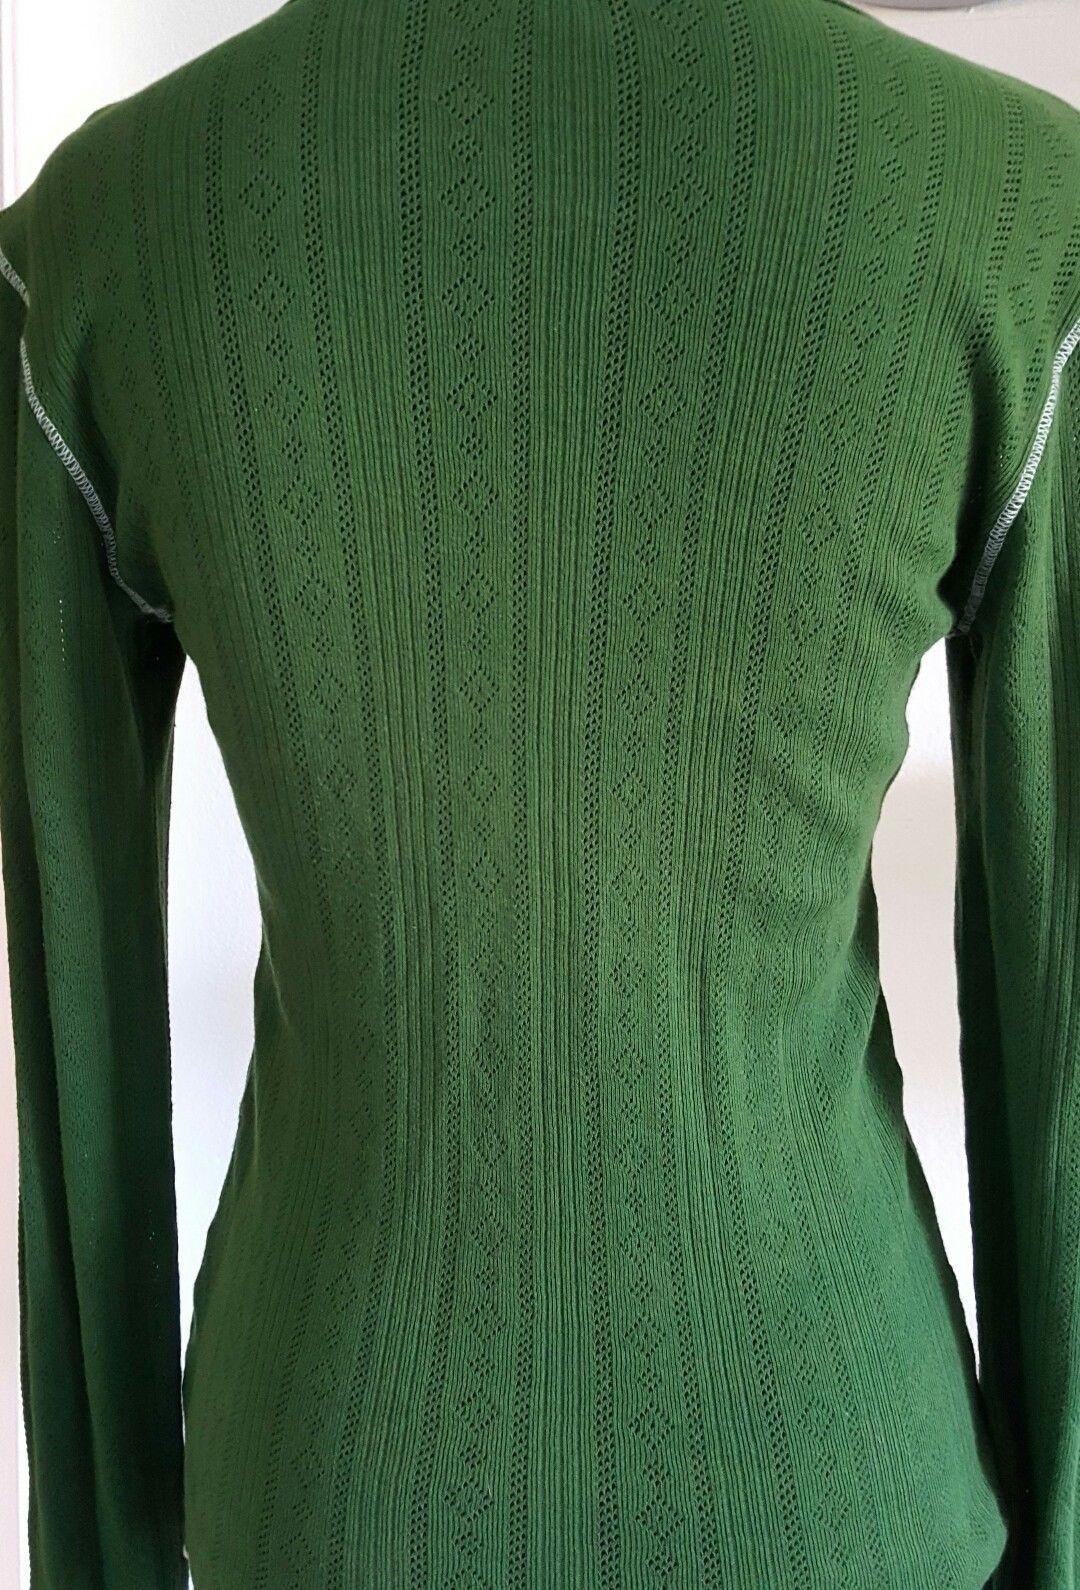 Shameless Green White Knit Top Long Sleeves Round Neckline Lightweight  Size L